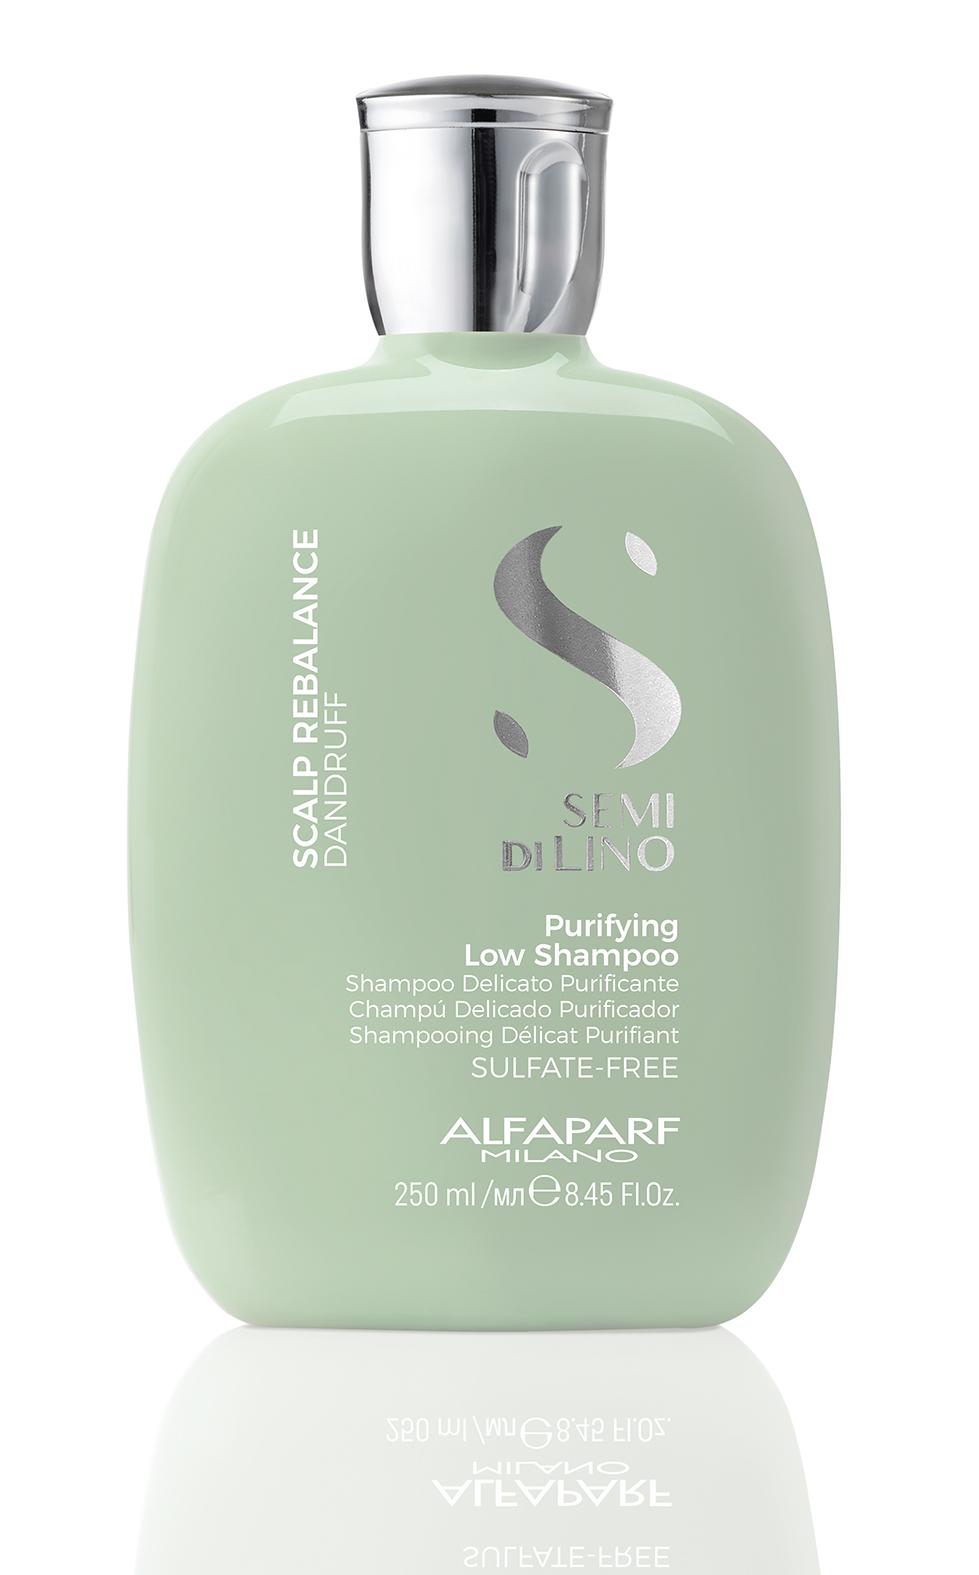 semi-di-lino-scalp-purifyng-low-shampoo-pf019472-fla-250ml-nolev